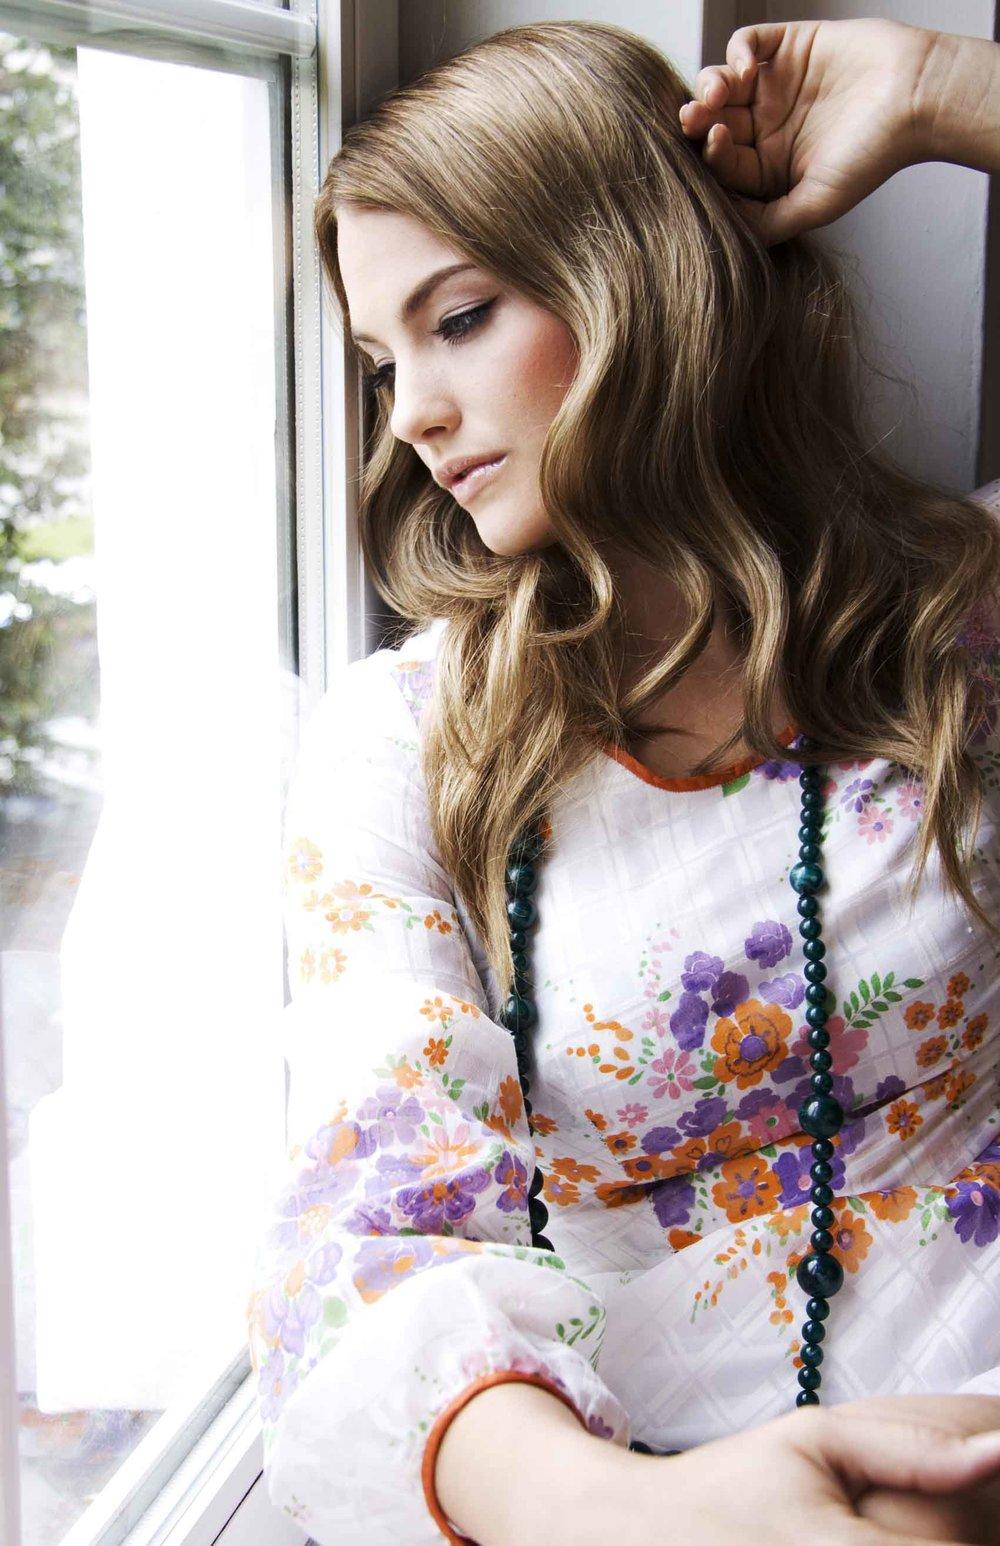 Leslie-Palmer 23.jpg